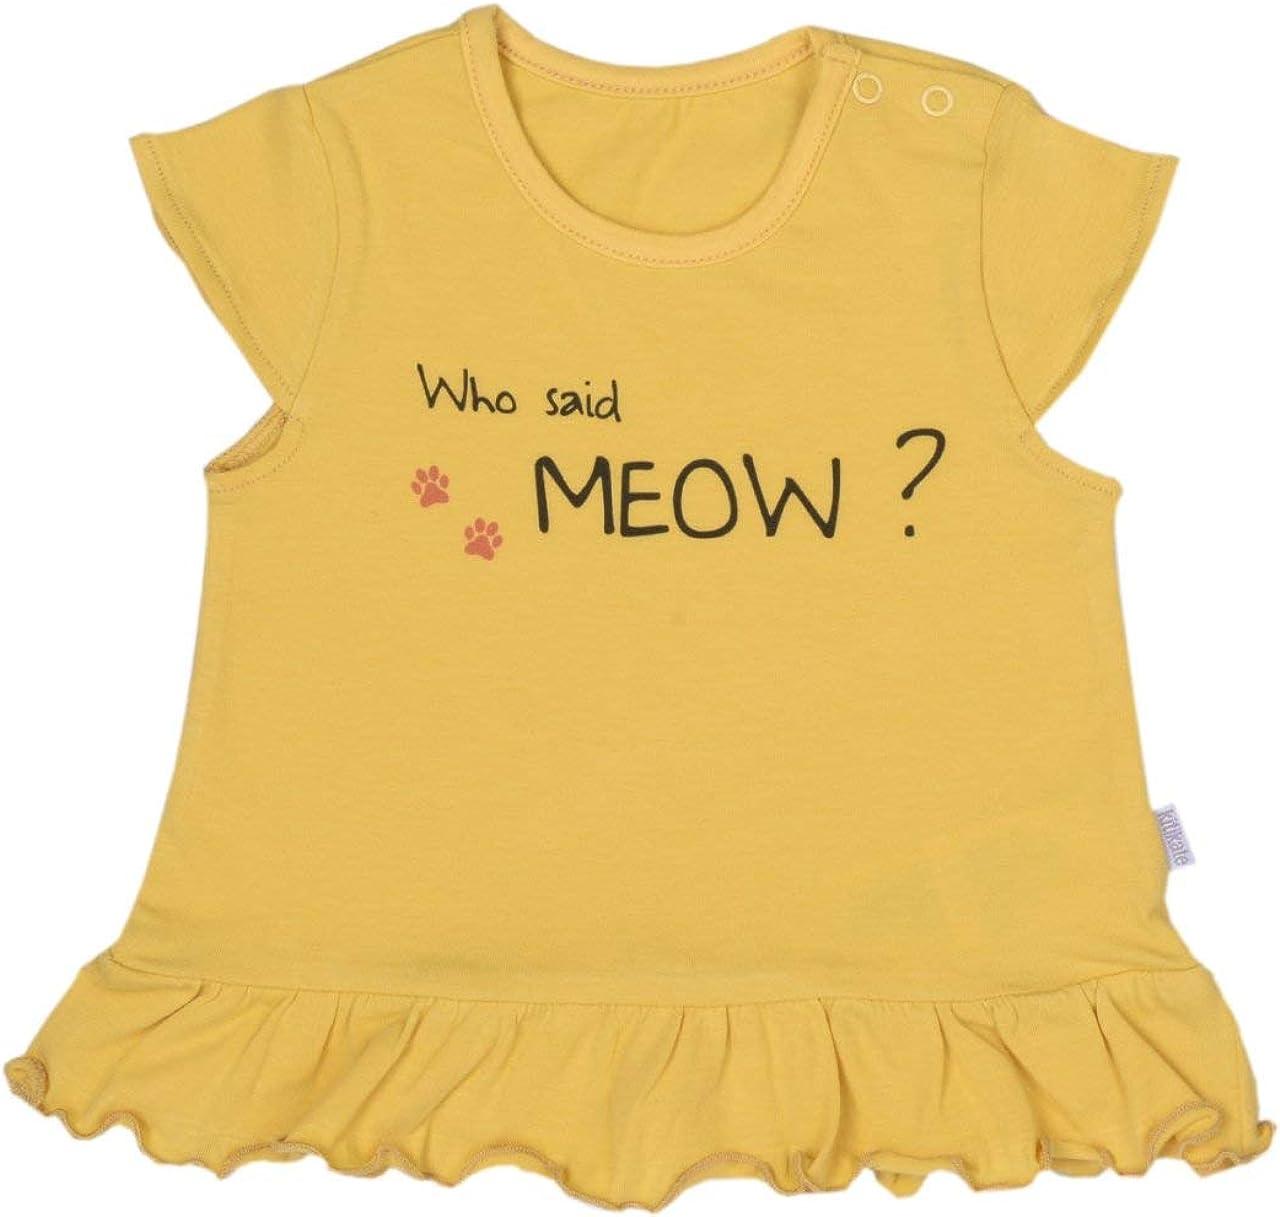 Kitikate 100% Organic Cotton Baby Girl Sleeveless Ruffle Meow T-Shirt, GOTS, Yellow